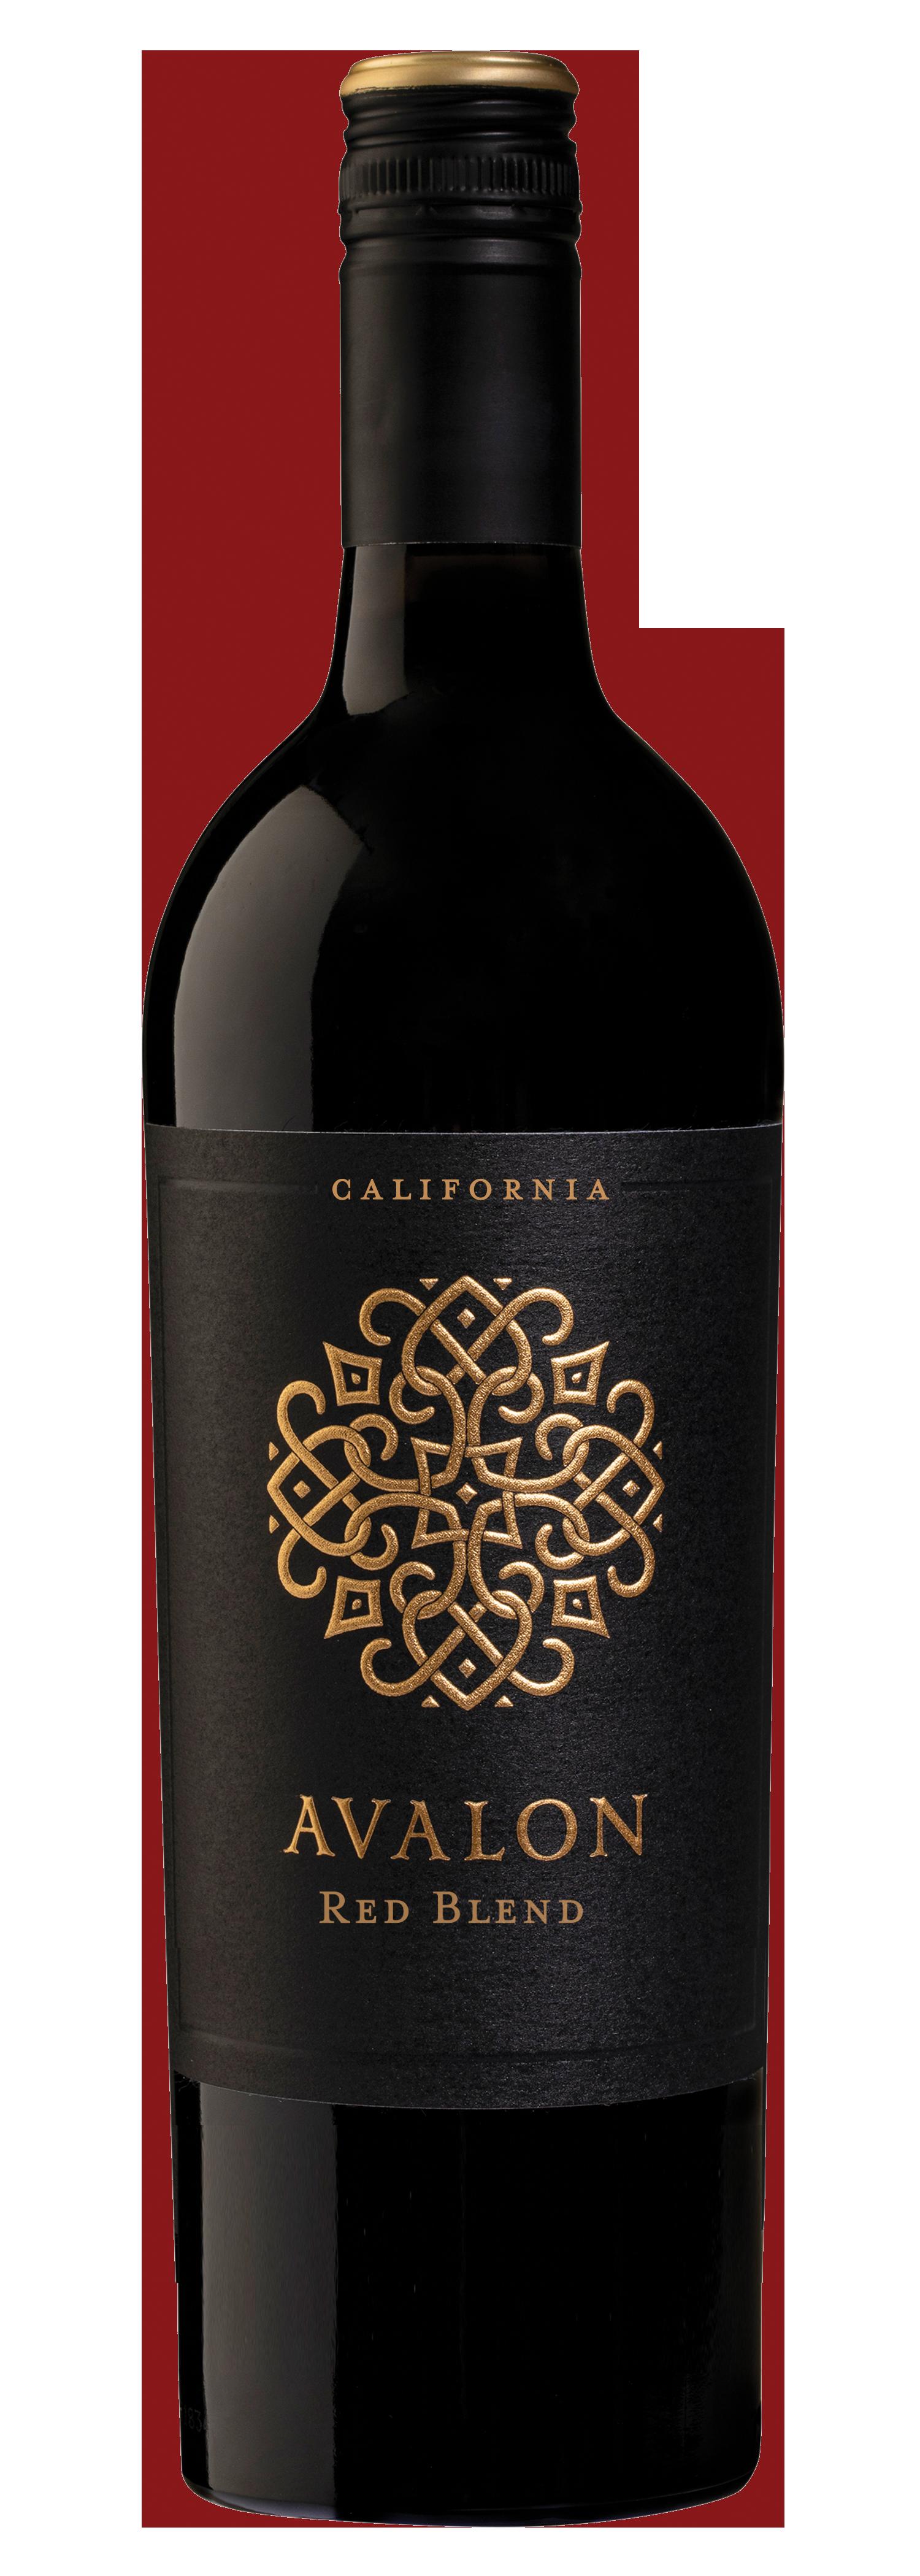 Avalon California Red Blend